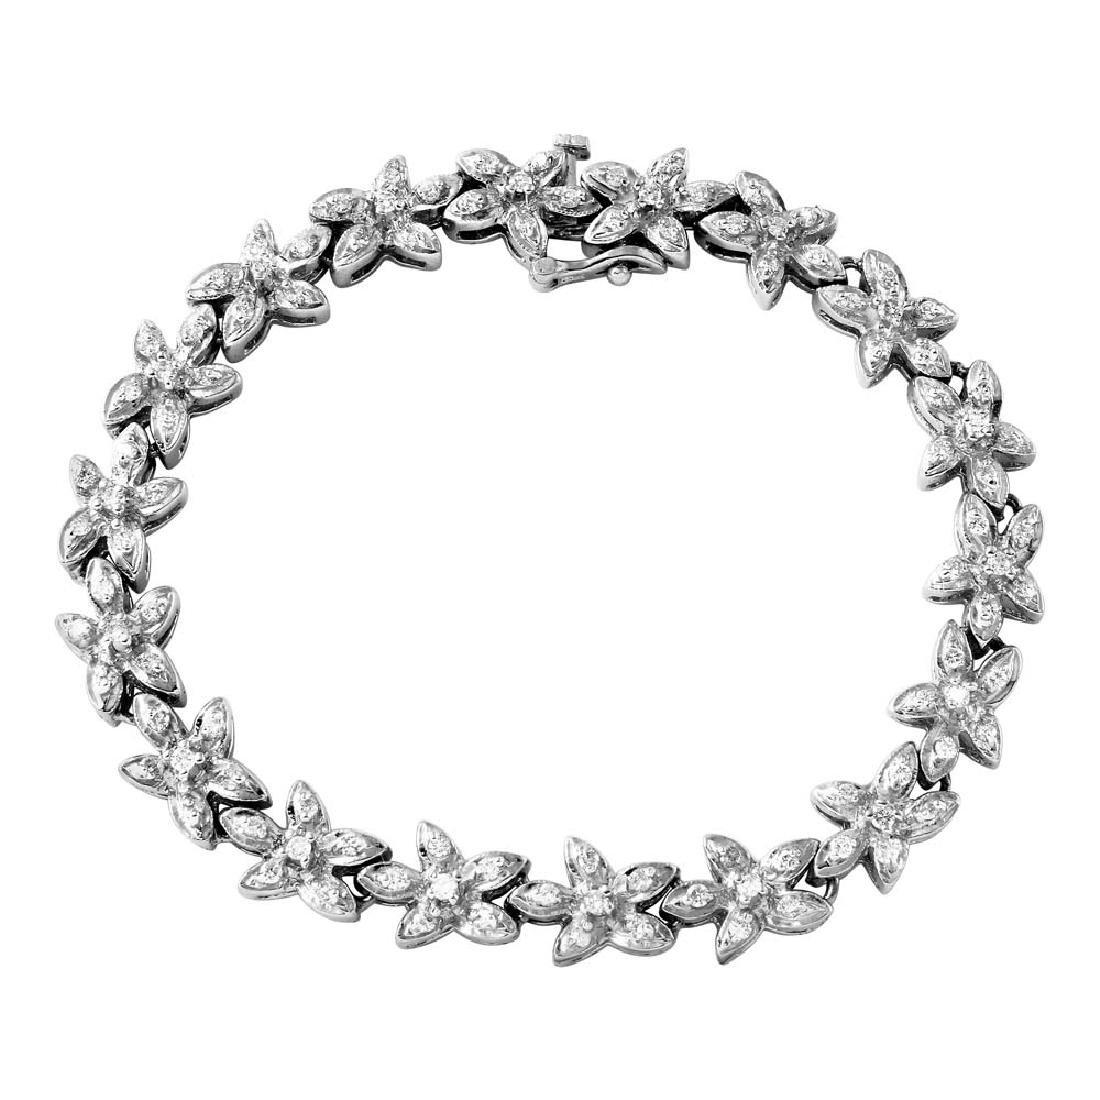 Genuine 1.67 TCW 14K White Gold Ladies Bracelet -